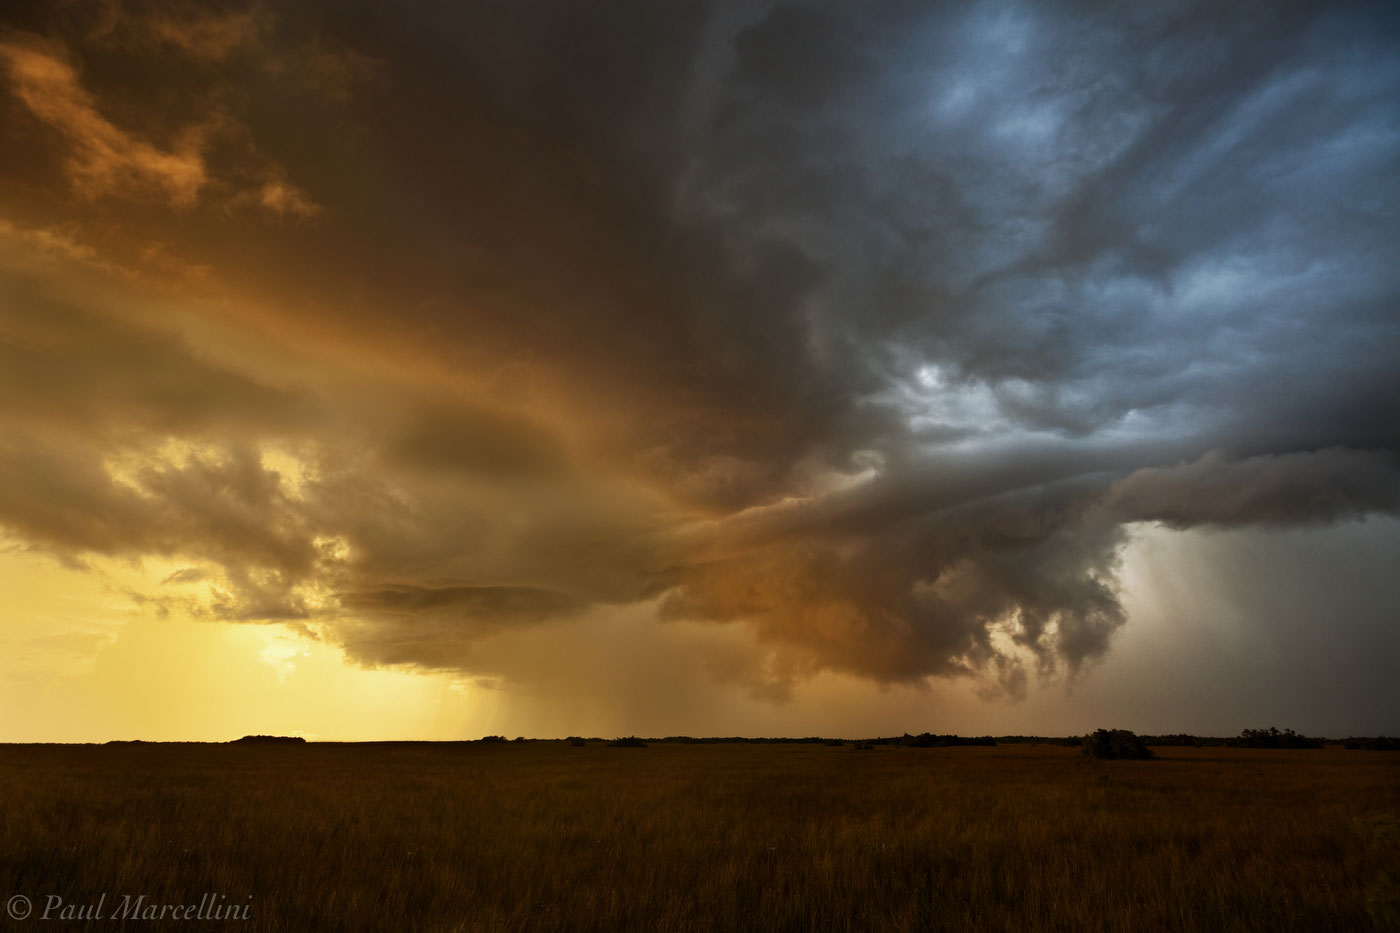 storm, everglades, summer, florida, nature, photography, florida national parks, photo